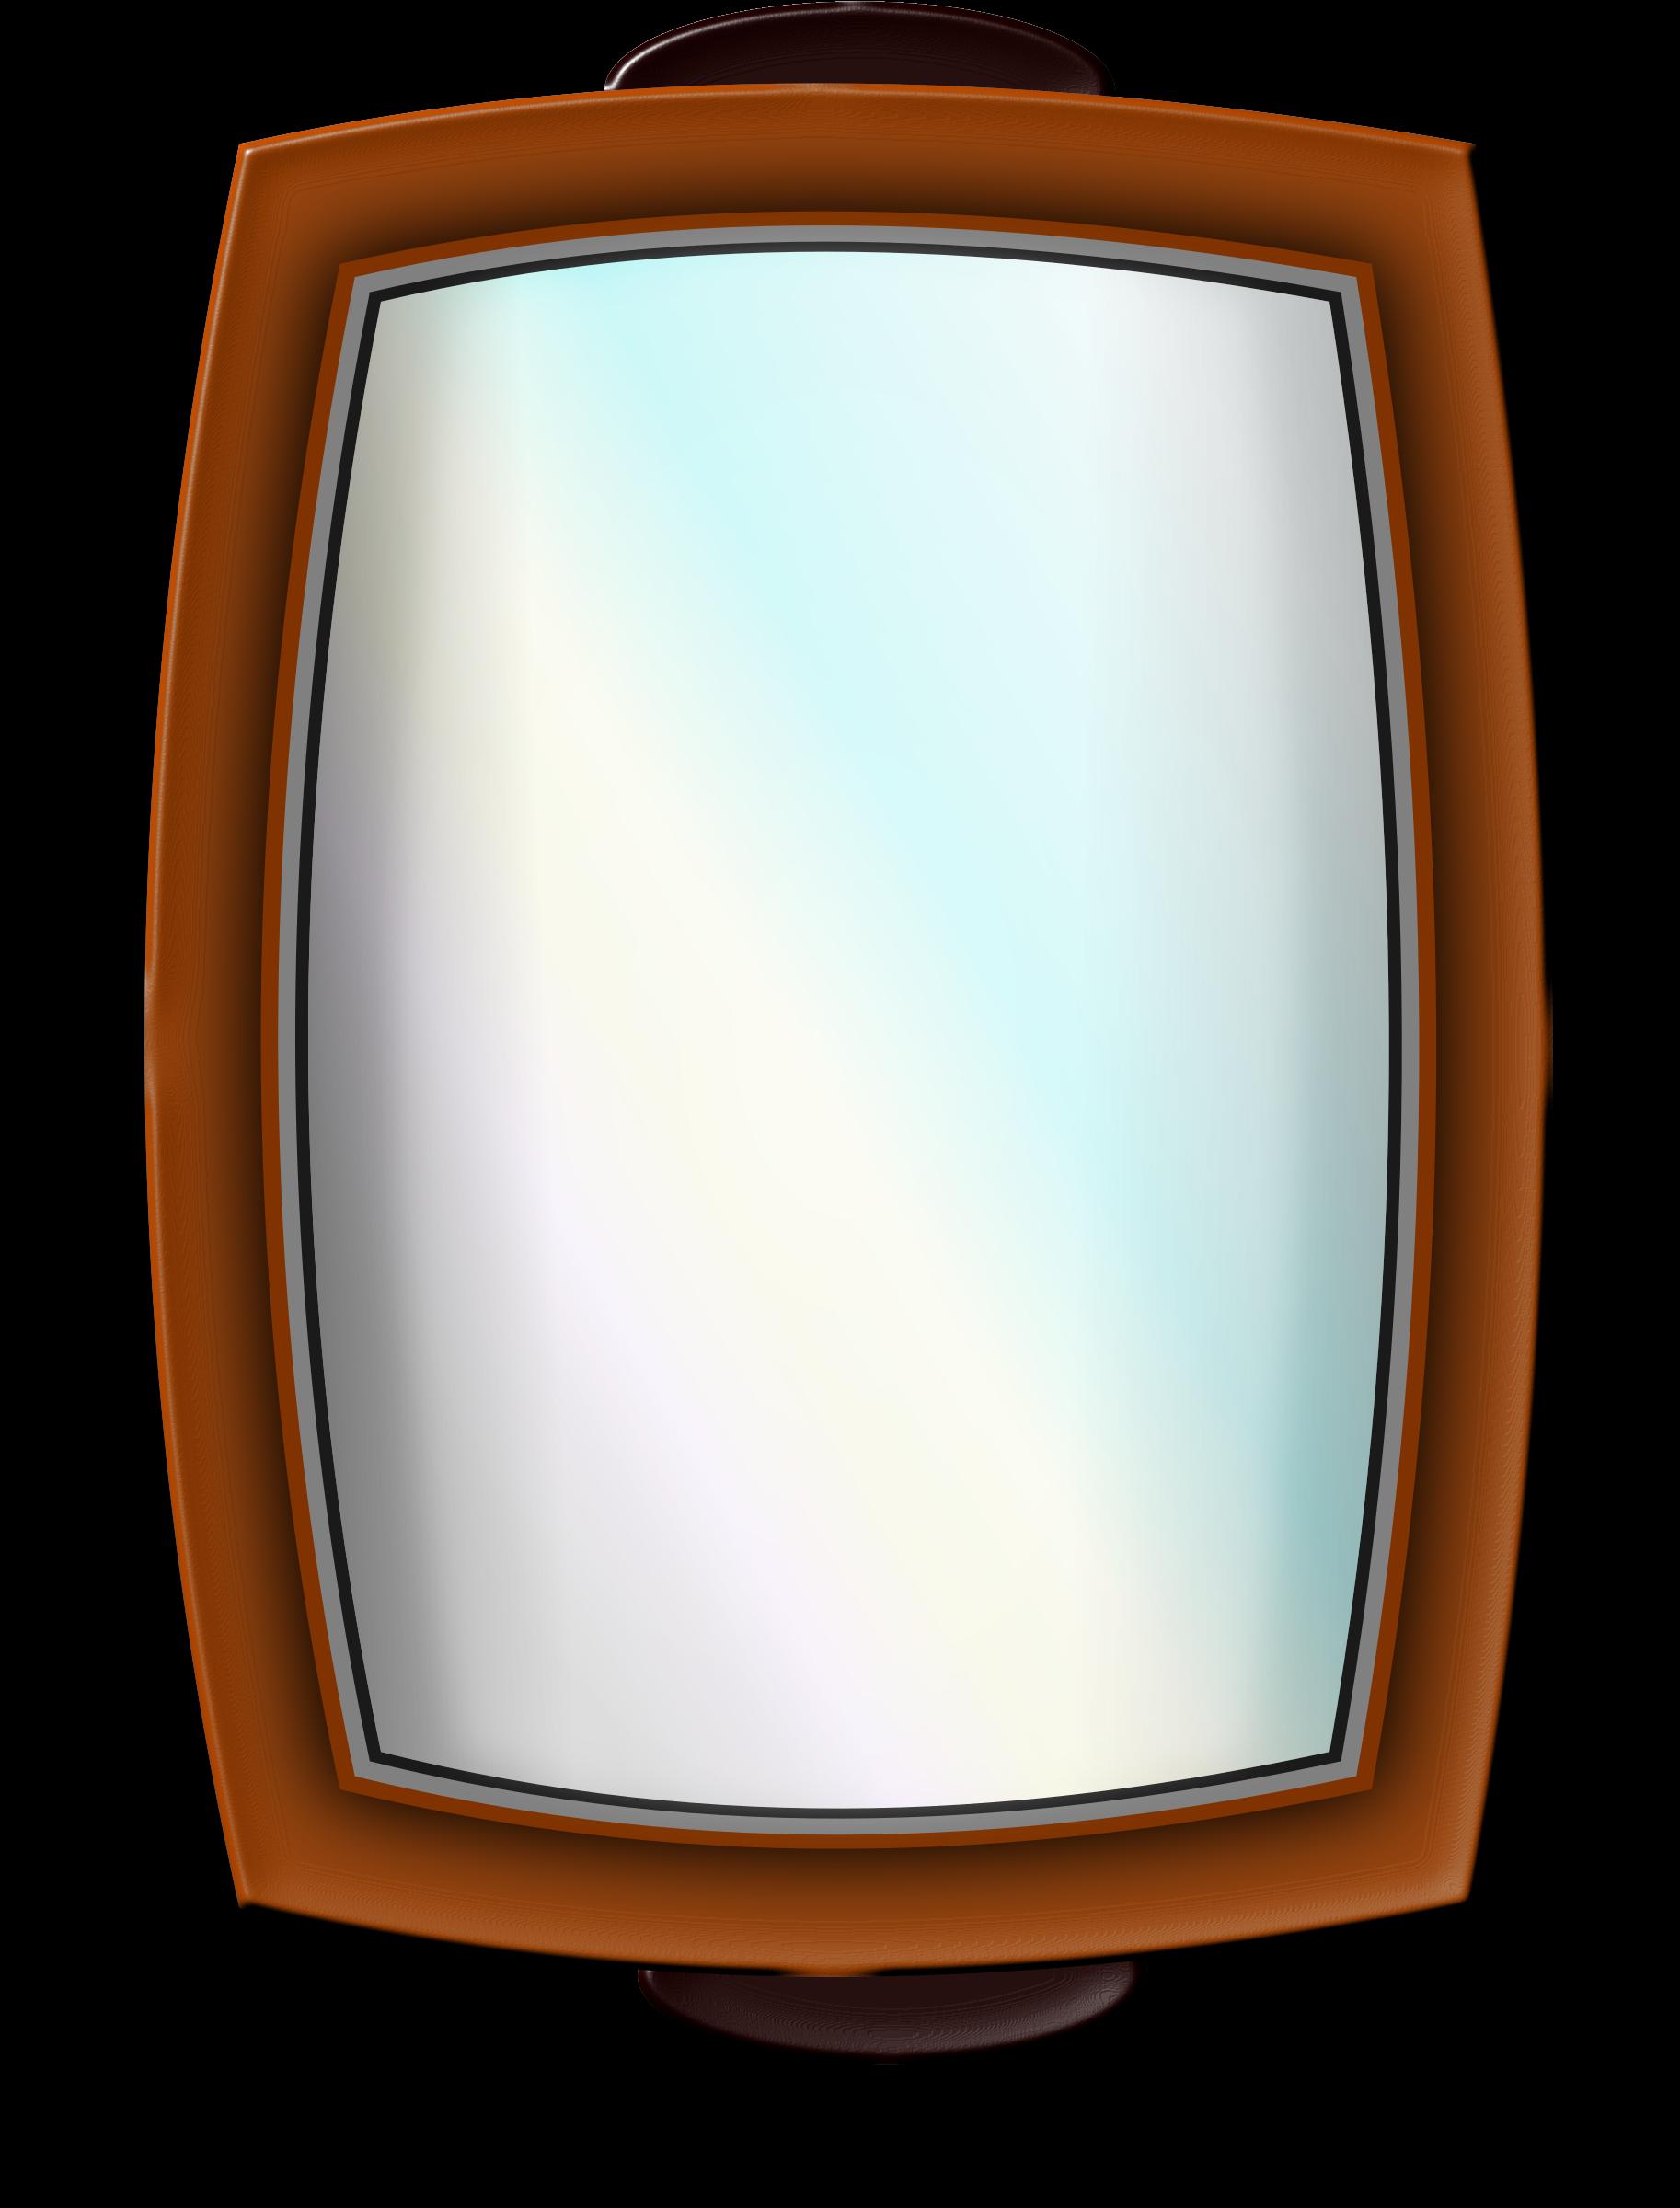 House of mirrors clipart vector Clipart - mirror vector